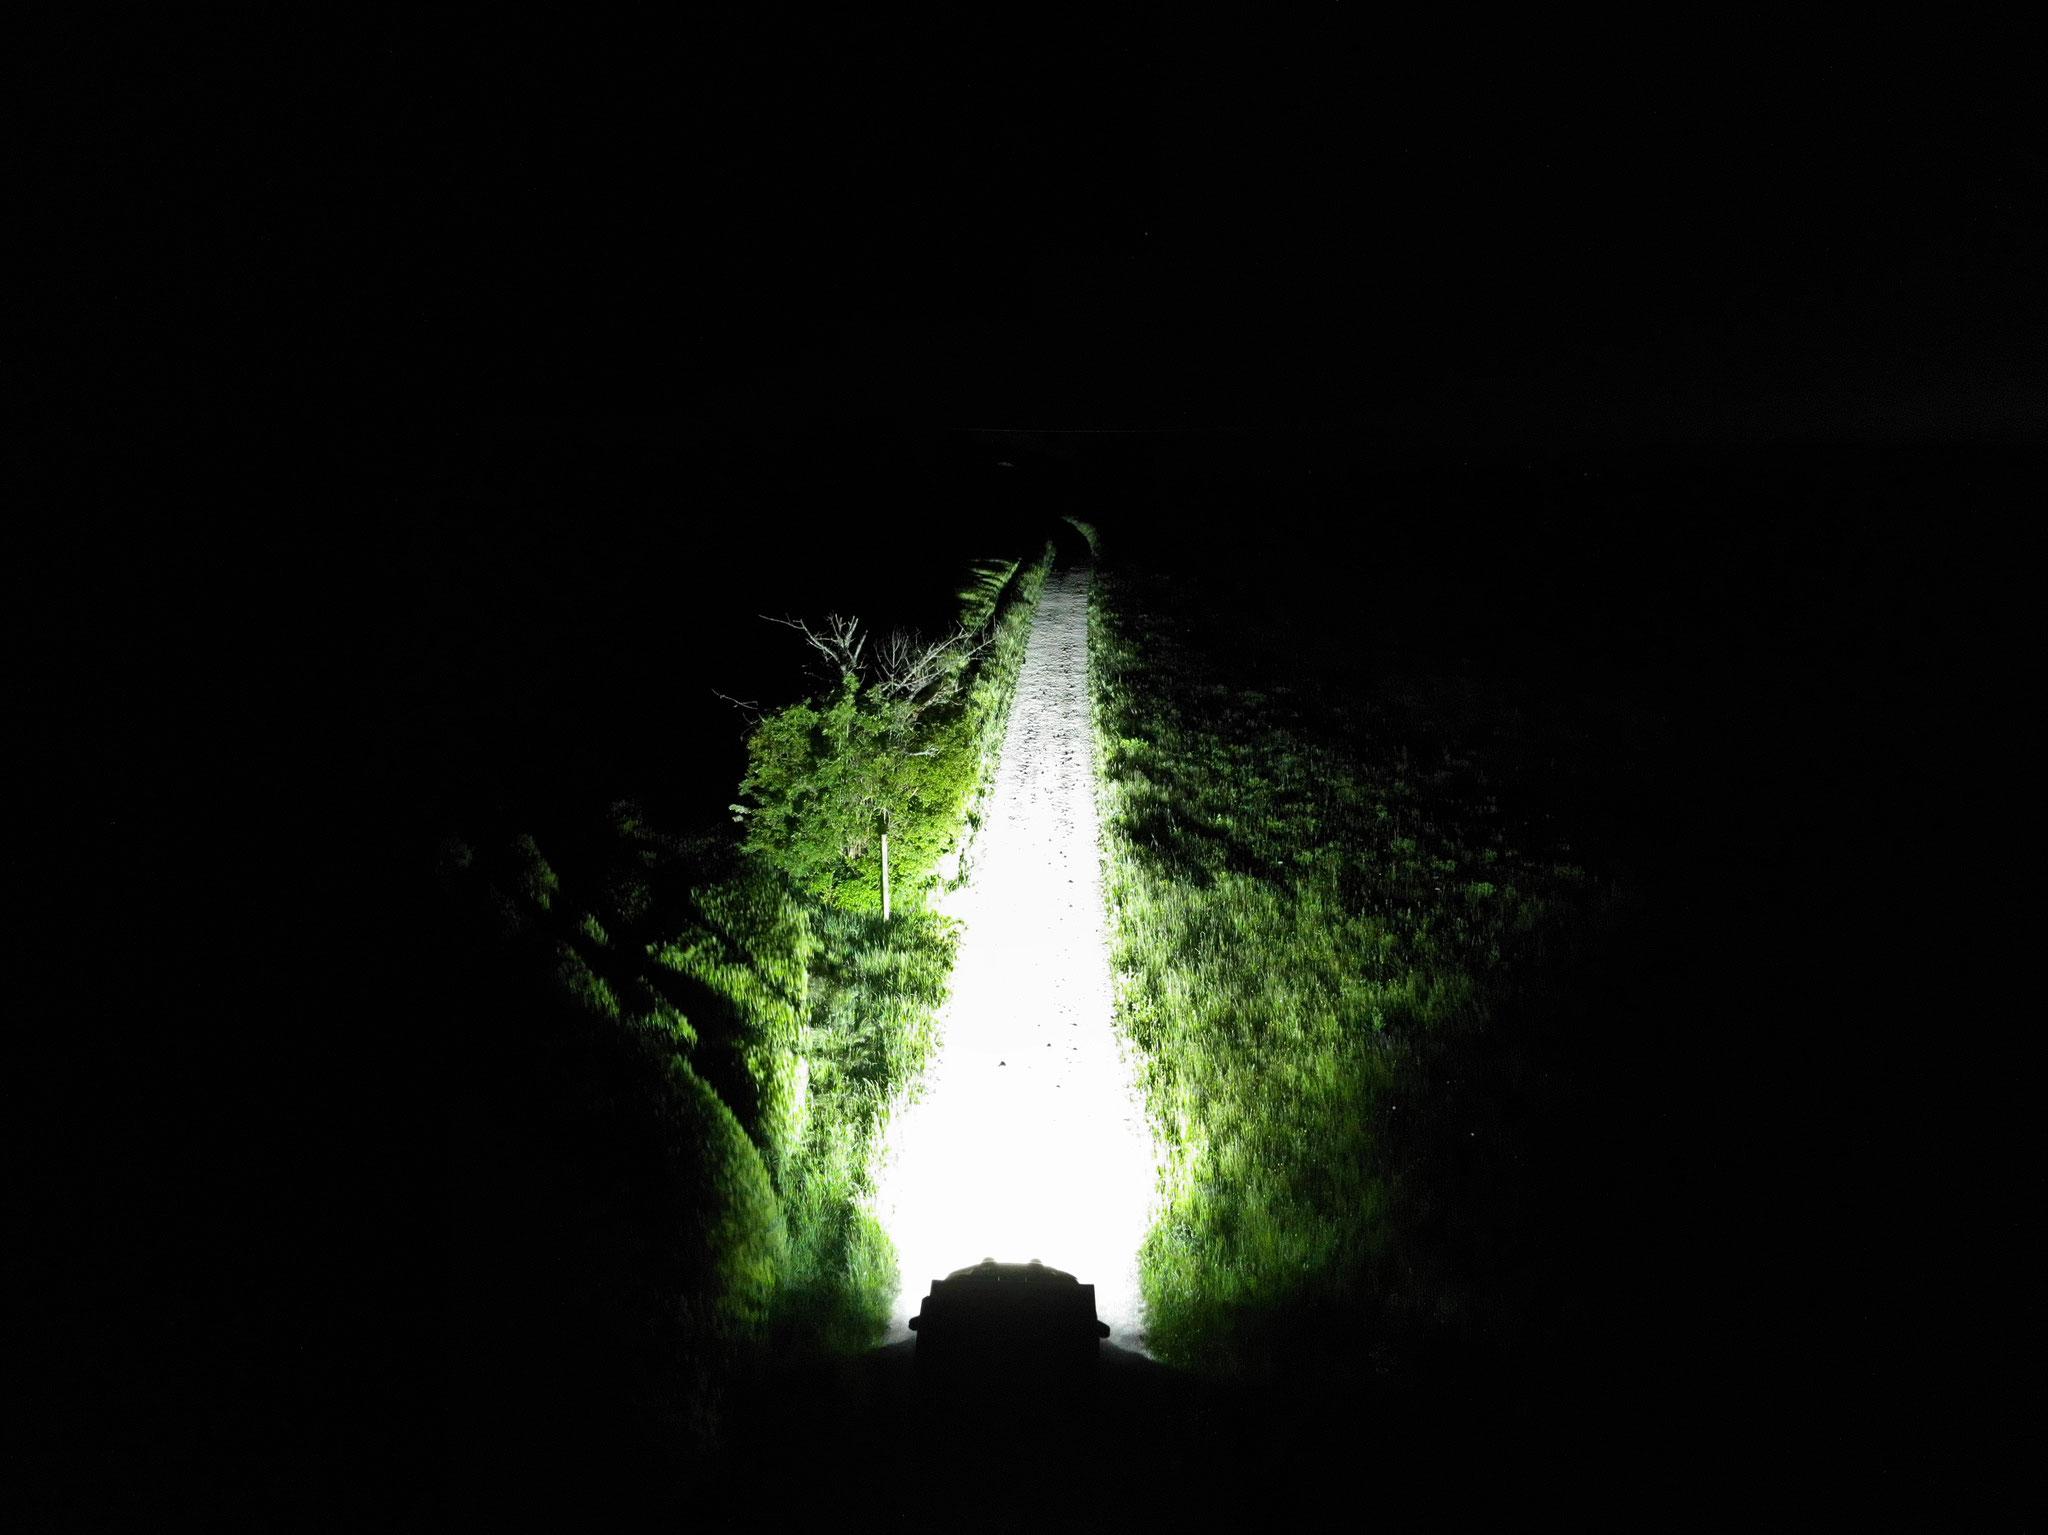 LED off road Scheinwerfer stvzo LTPRTZ DL011-C Lightpartz Kombo flood spot lamp Highbeam Strassen zugelassene Offroad Scheinwerfer e geprüft hell #projektblackwolf